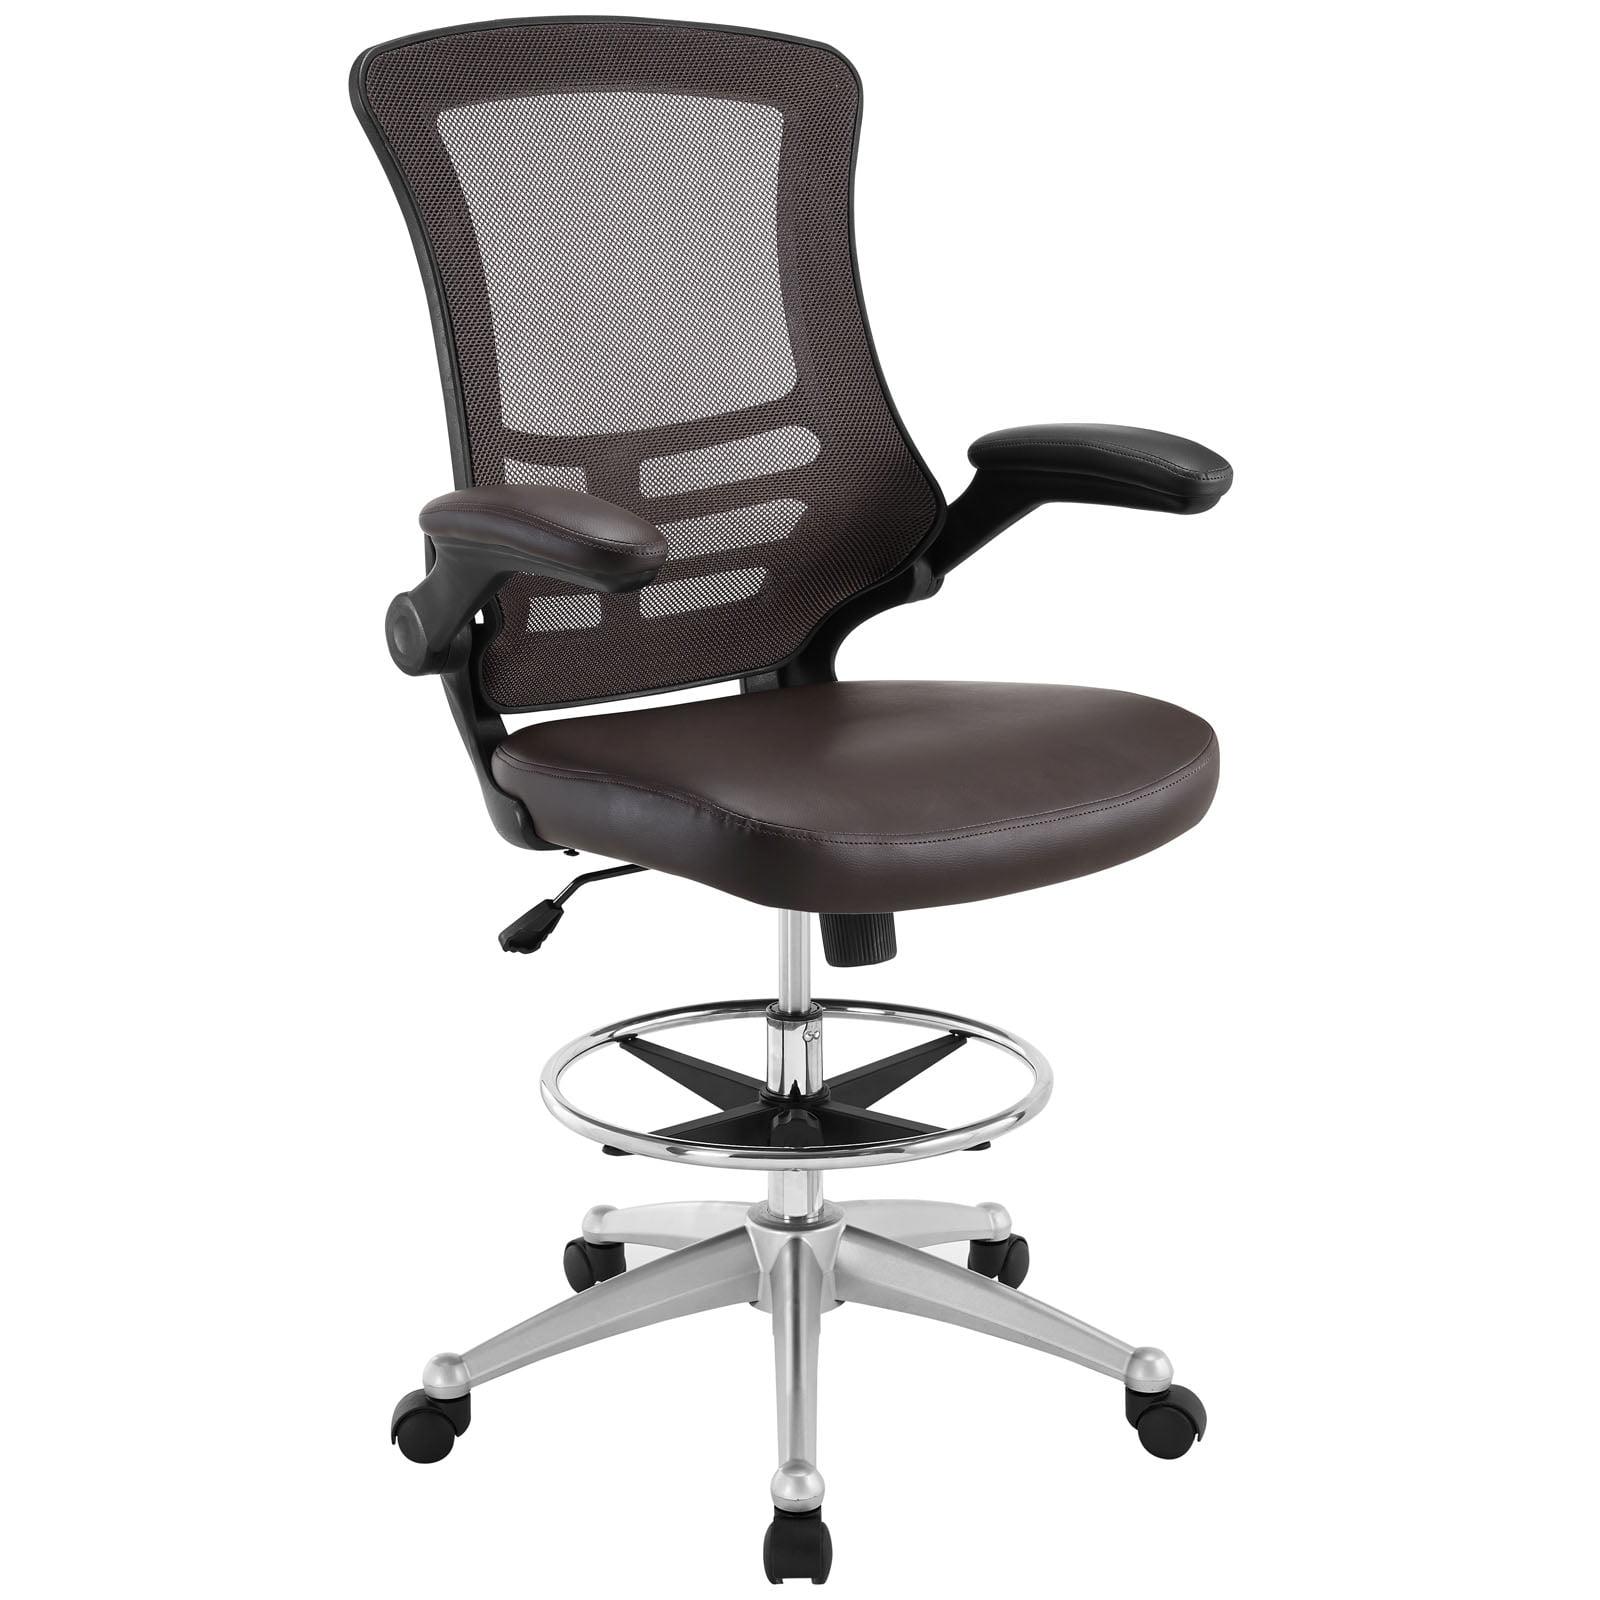 Modern Contemporary Work Office Chair Brown